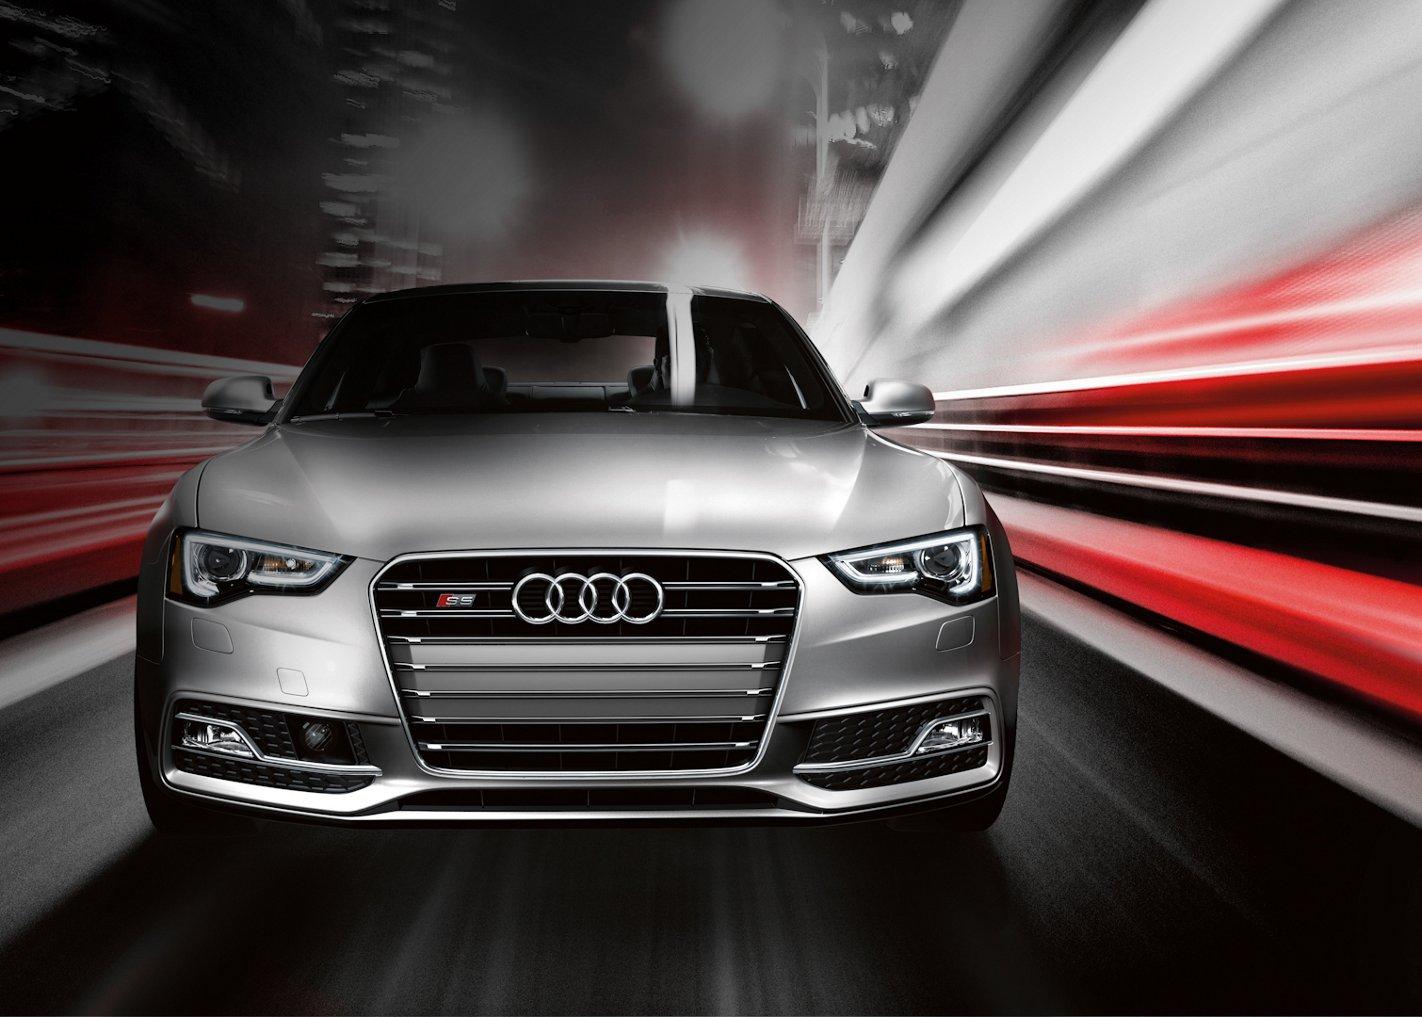 New Audi S5 Exterior main image